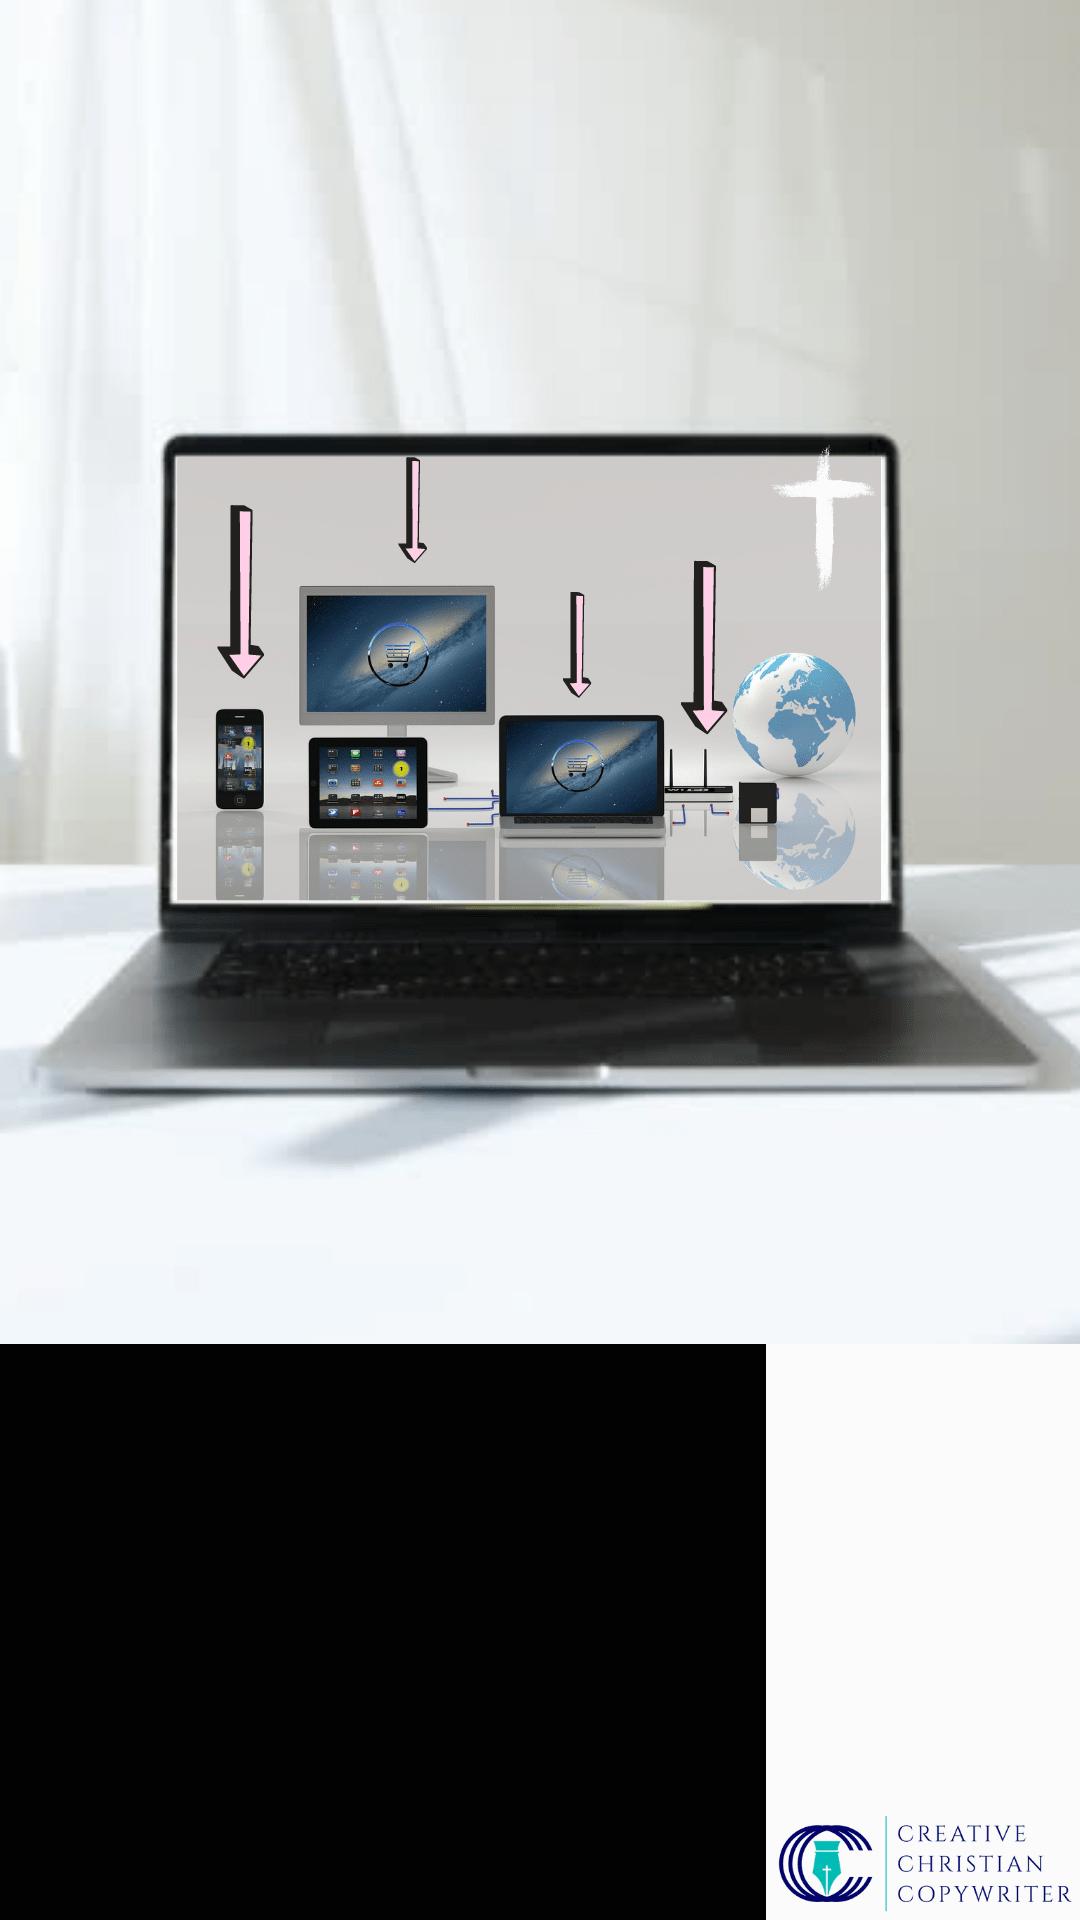 Faith Based Digital Marketing Company